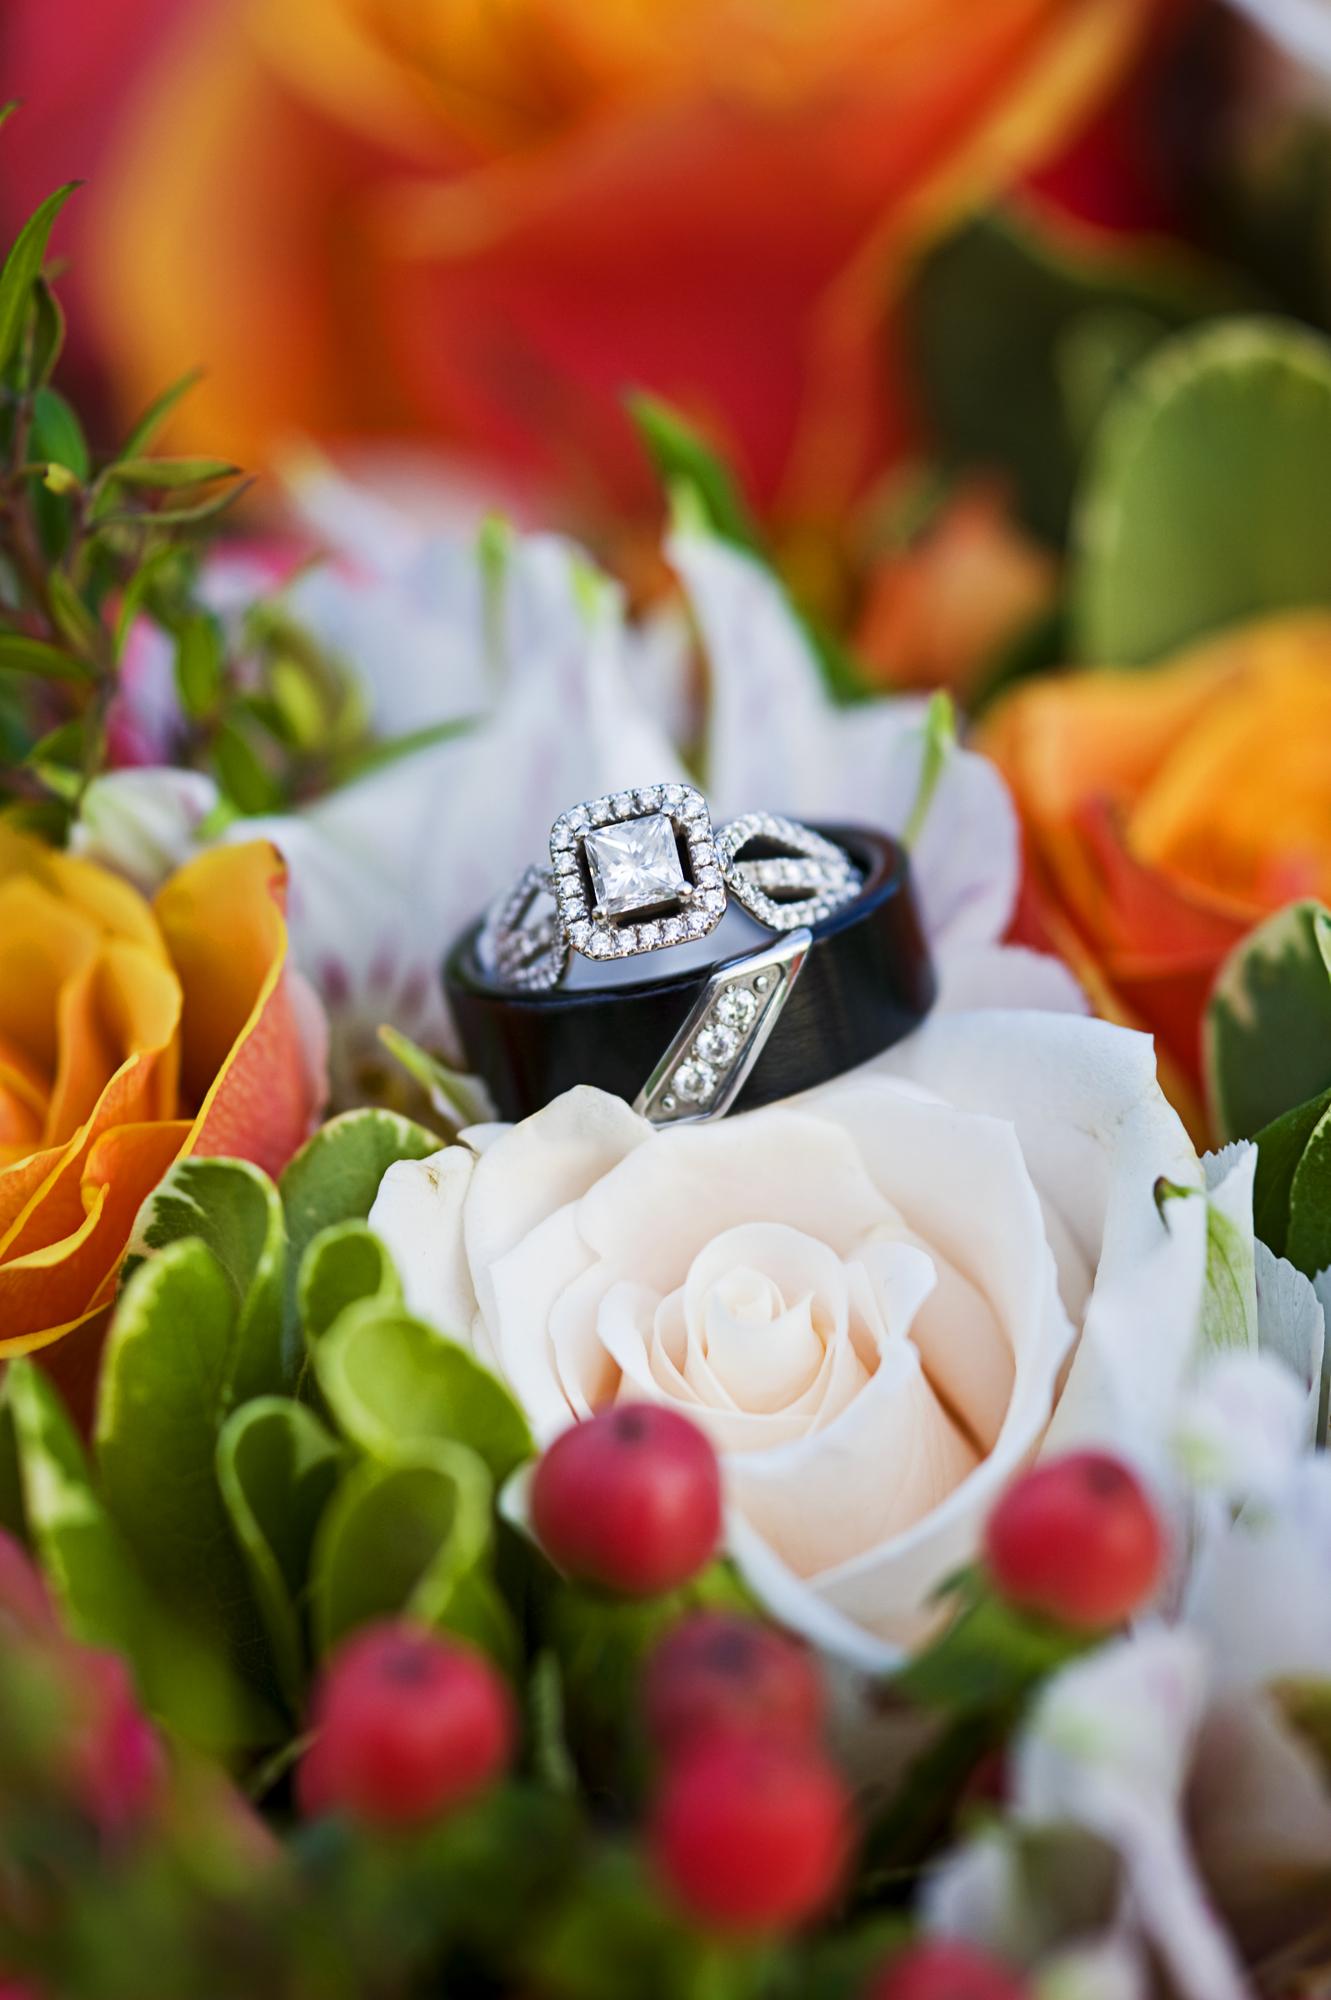 20151205_DanaPoint_PalisadesGazebo_Wedding_BrandonMelissa_088web